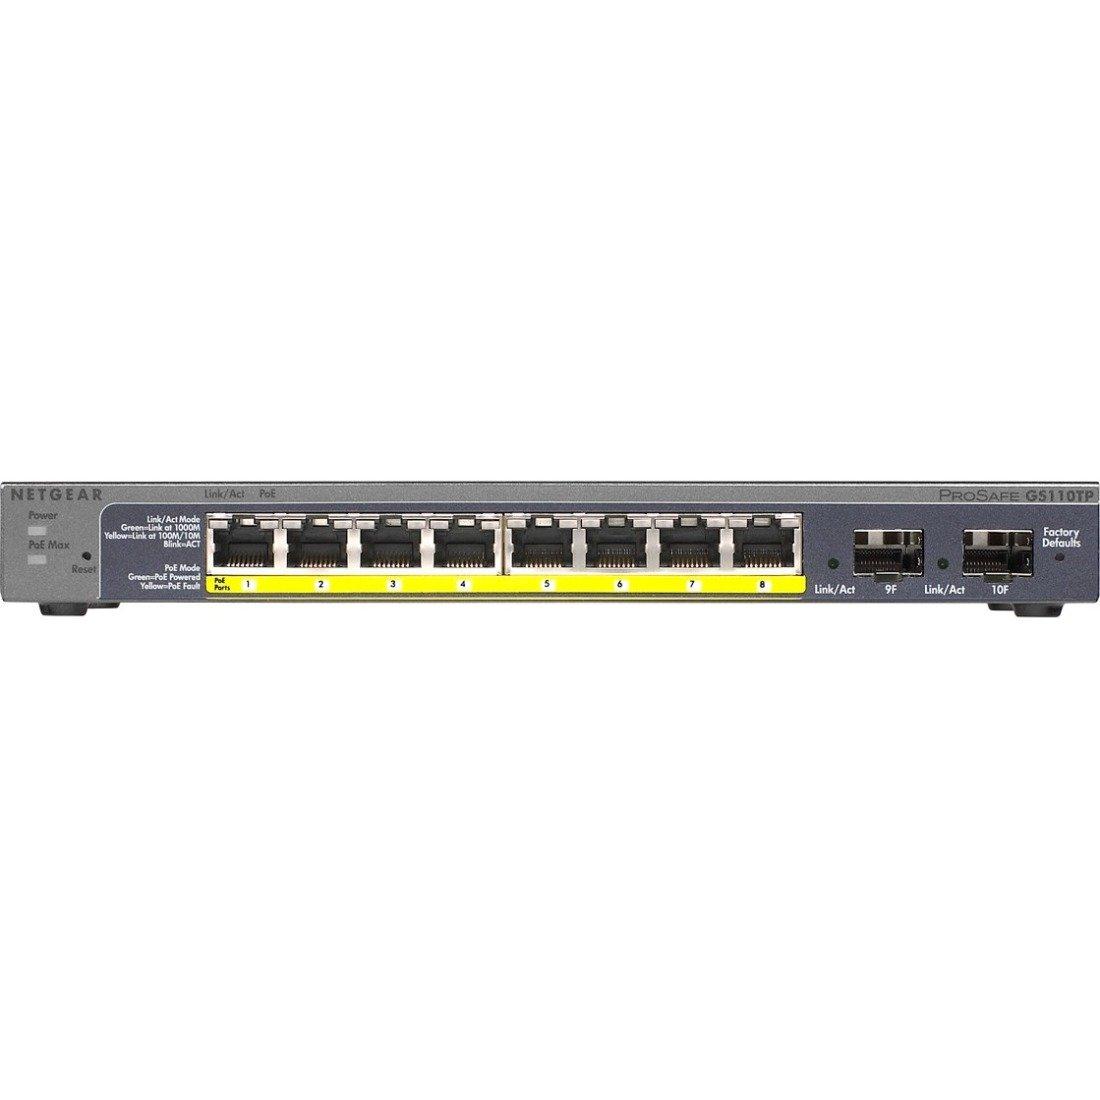 Netgear Prosafe GS110TP 8-Port Gigabit PoE Smart Switch with 2 Gigabit Fiber SFP